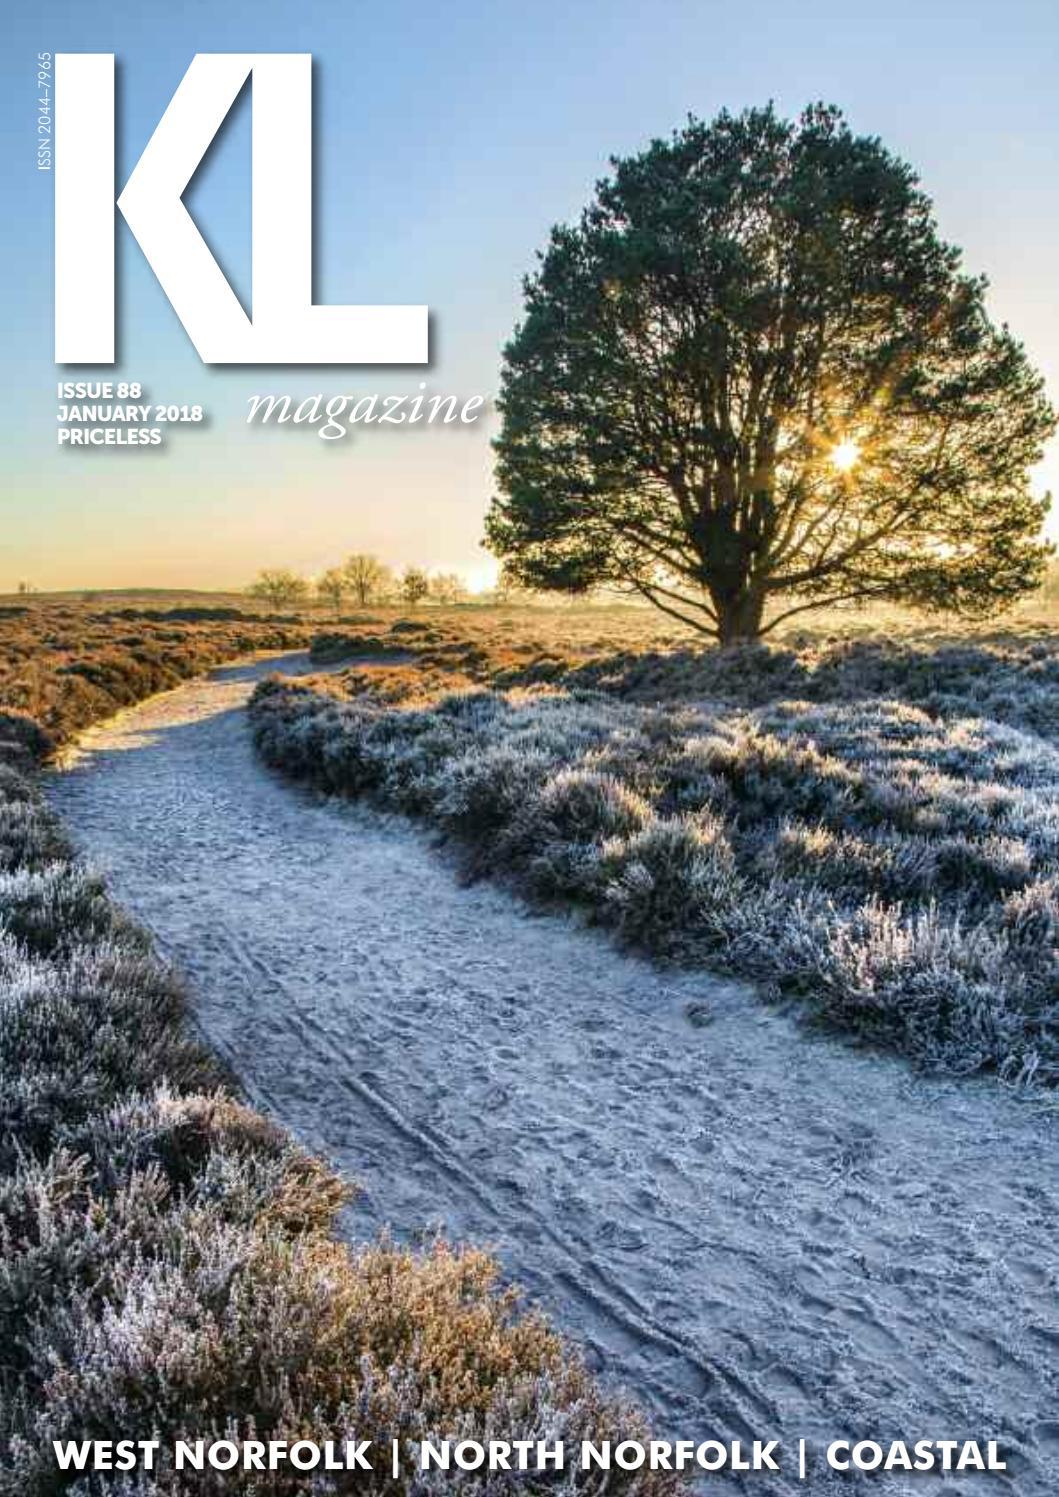 KL Magazine January 2018 by KL magazine - issuu